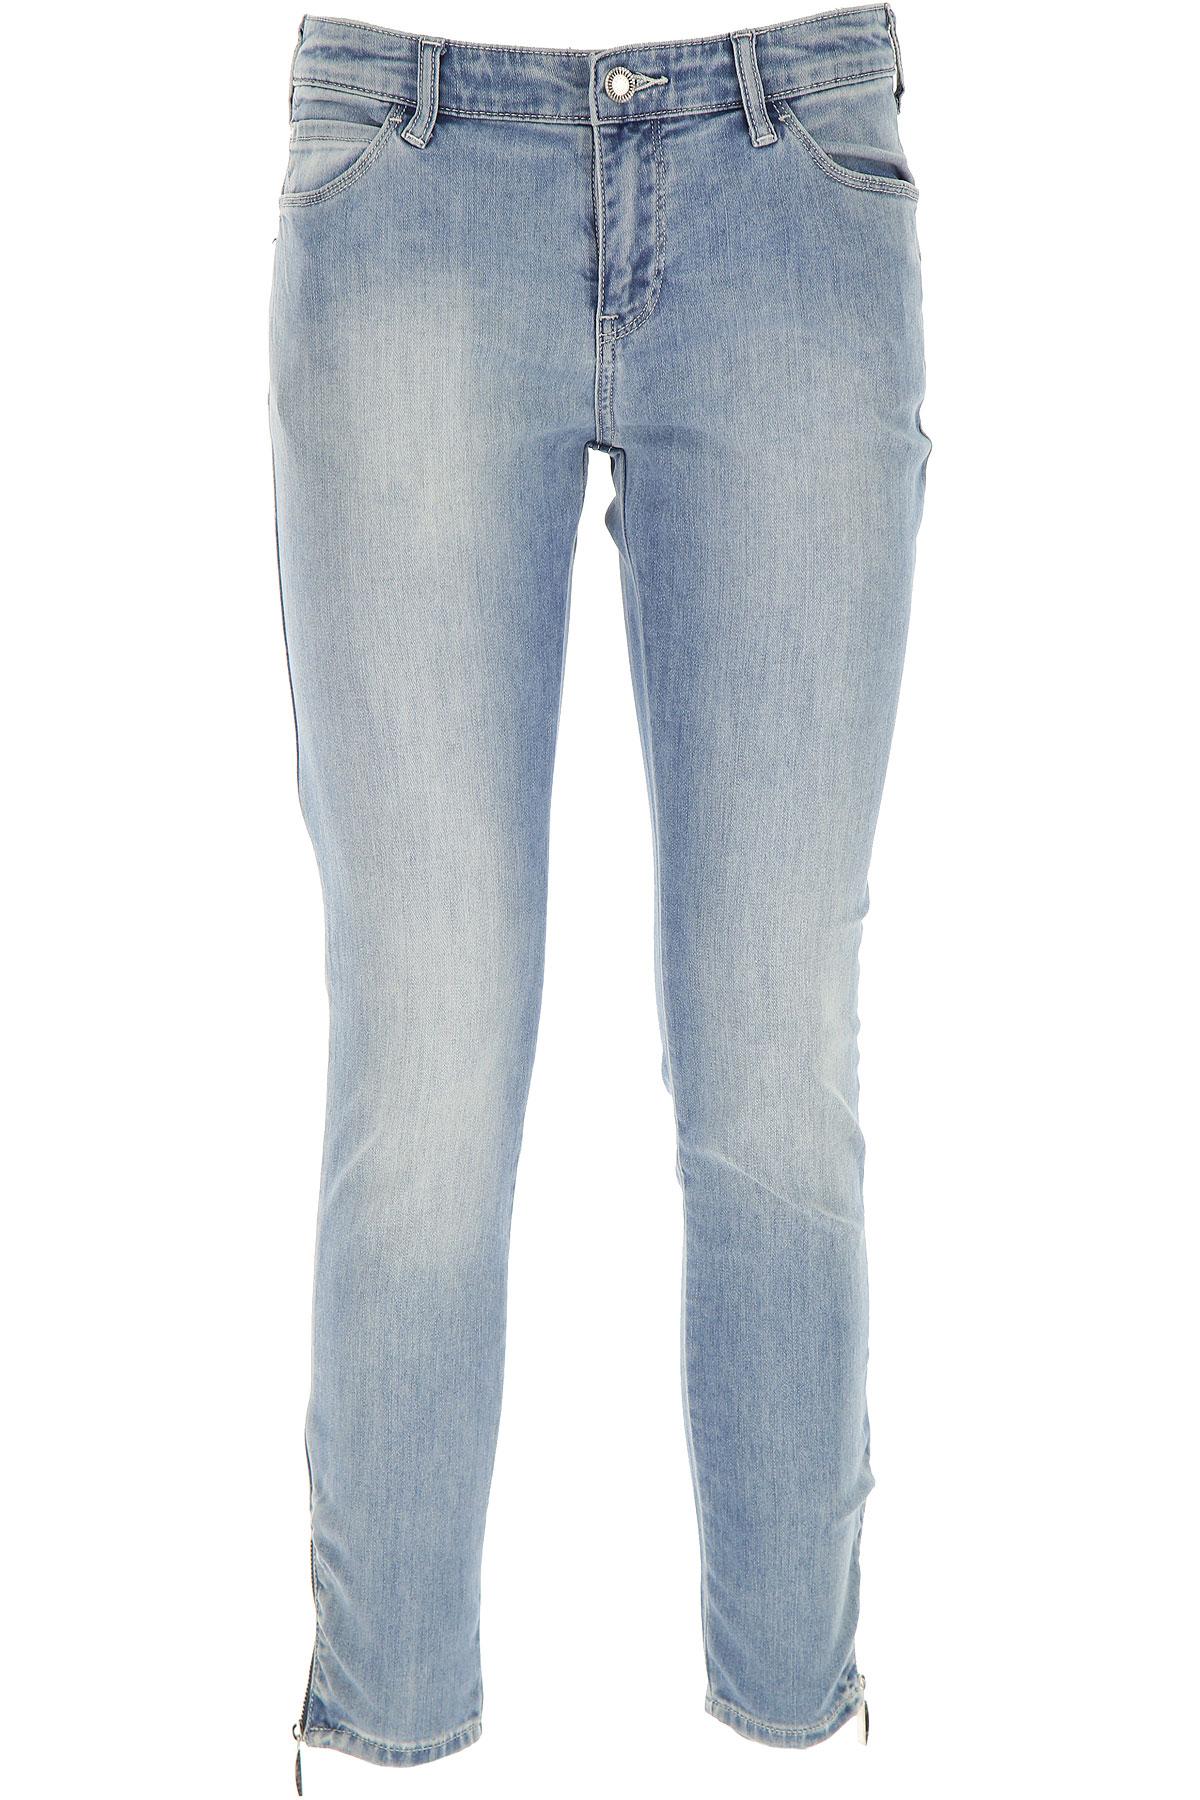 Giorgio Armani Jeans On Sale in Outlet, Light Blue Denim, Cotton, 2019, 27 30